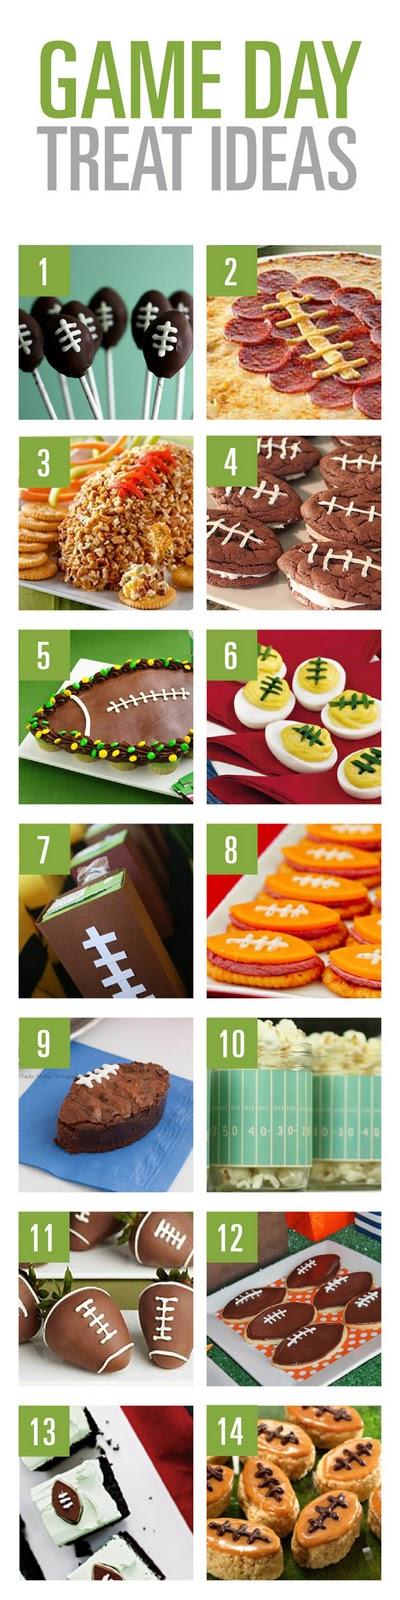 Super Bowl Eats: Grand Finale